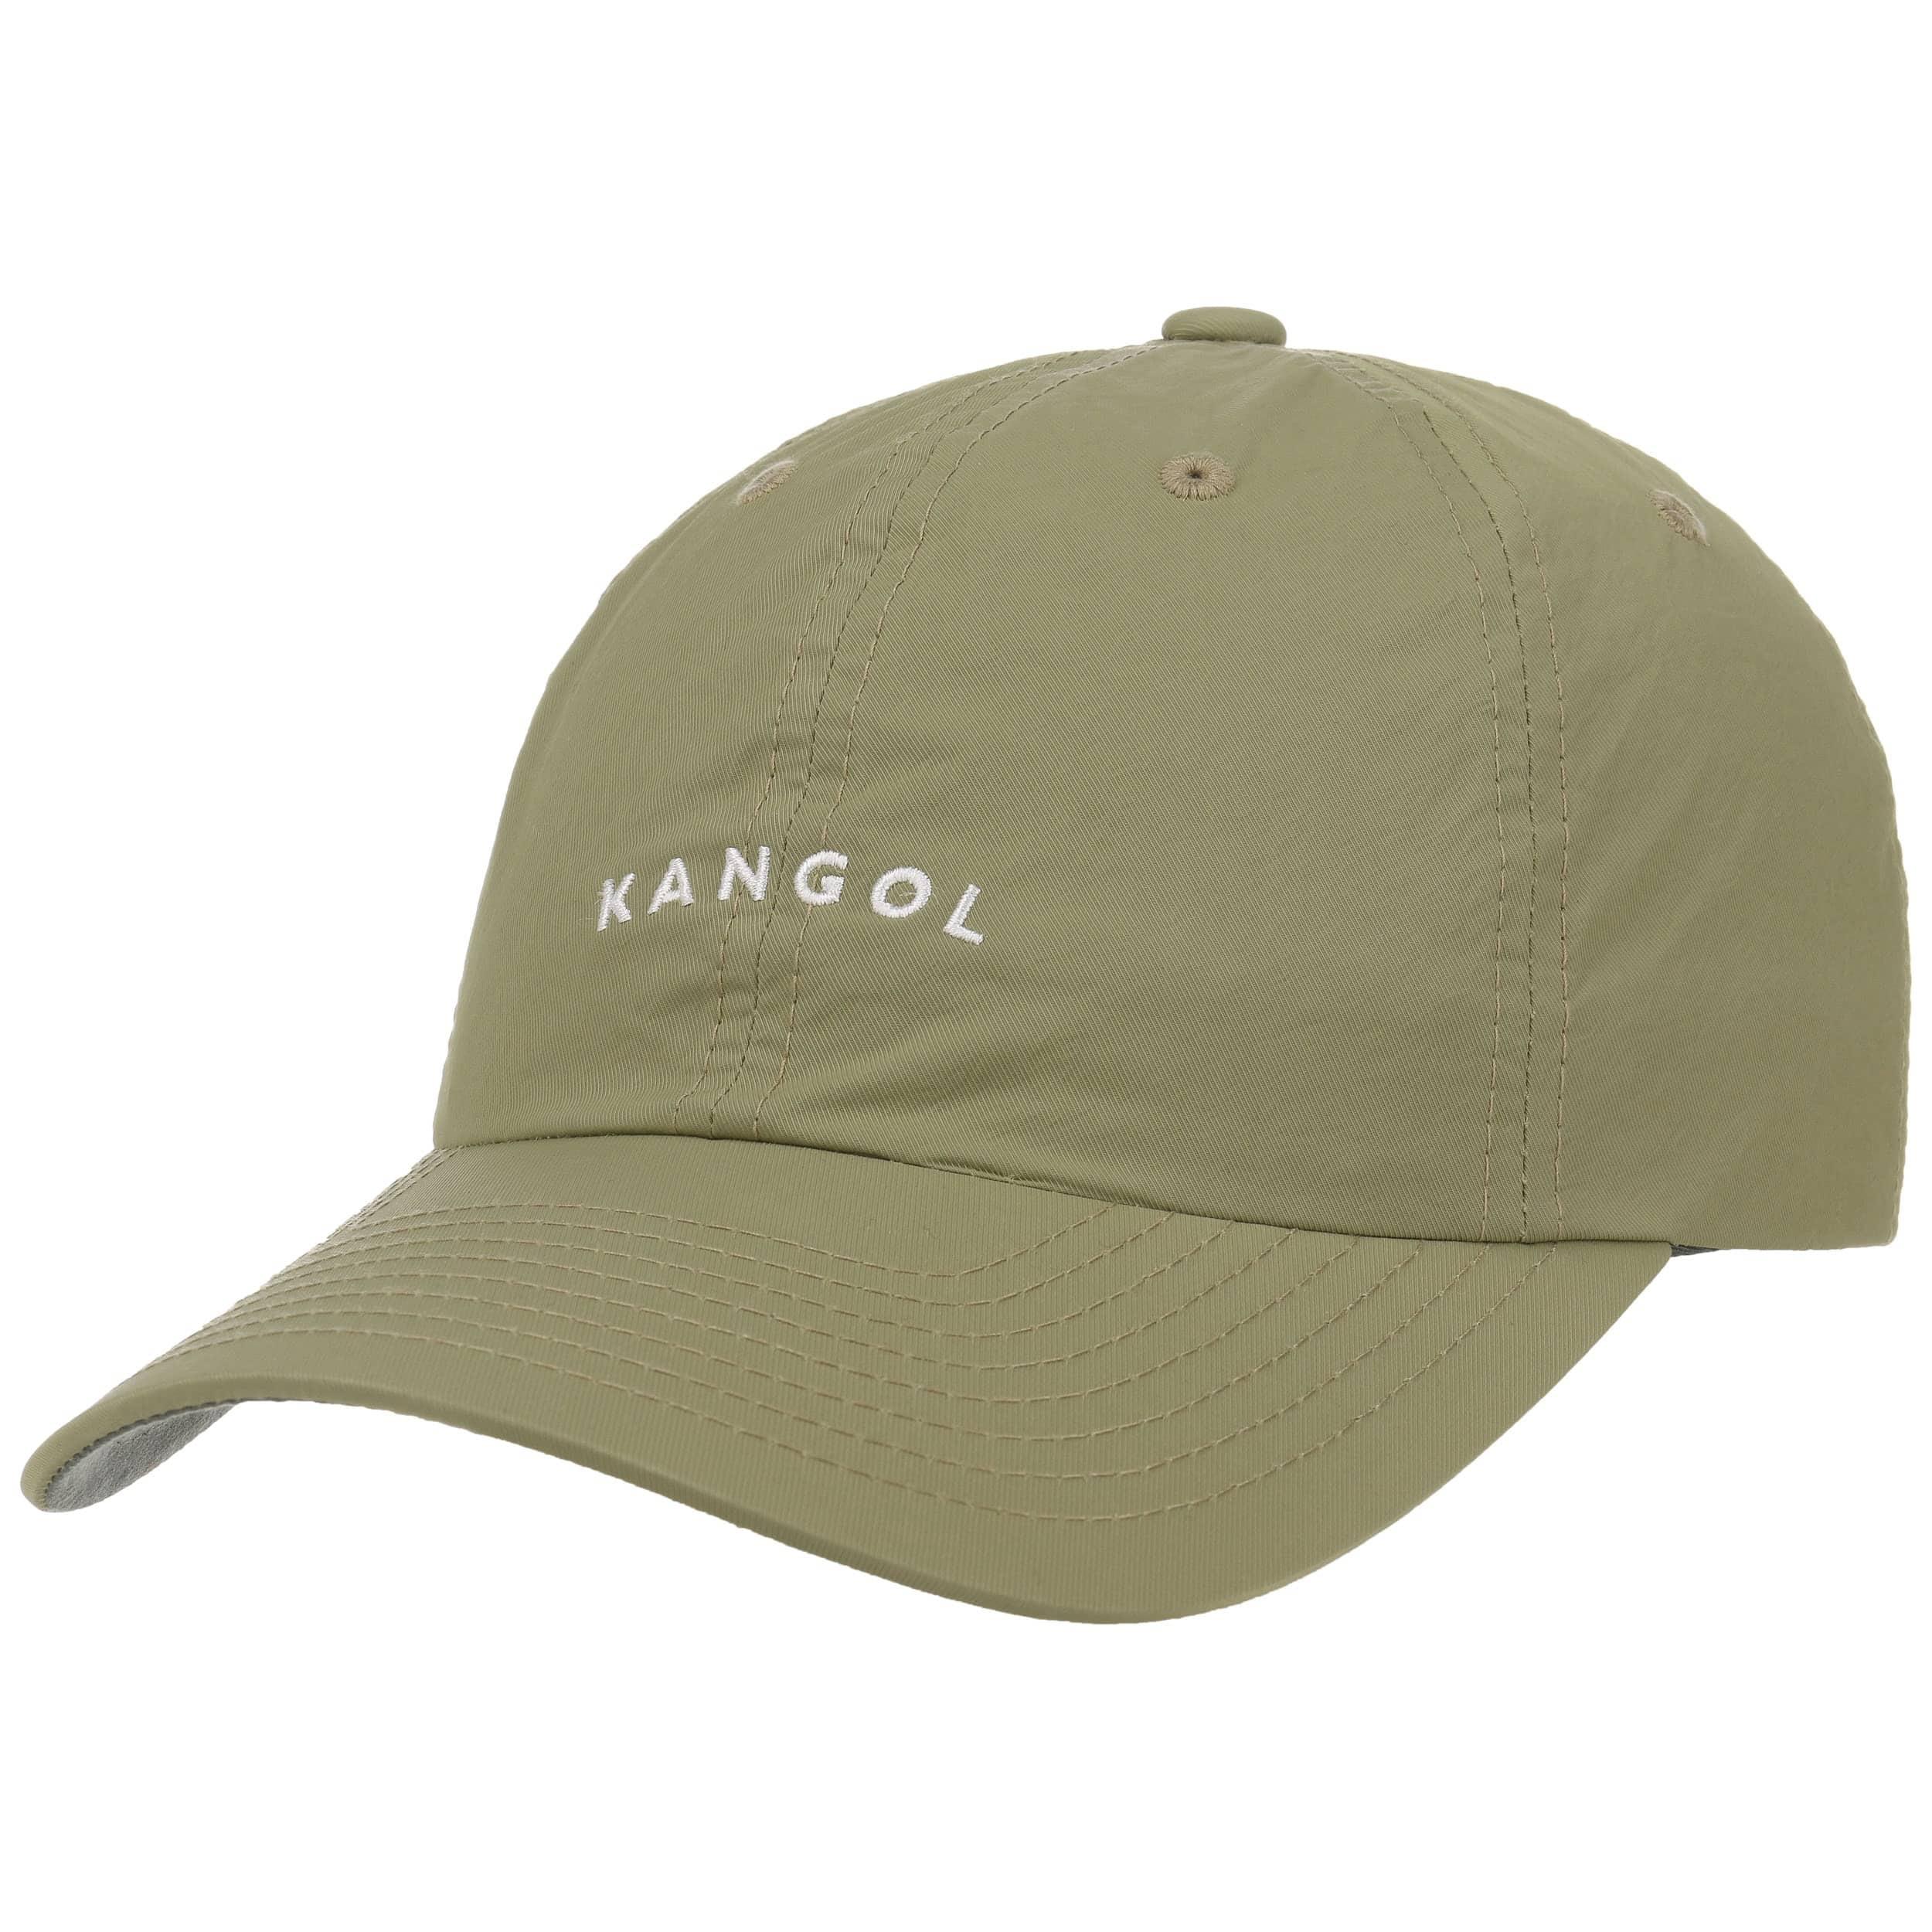 554cf94fd62 ... Vintage Baseball Cap by Kangol - khaki 5 ...